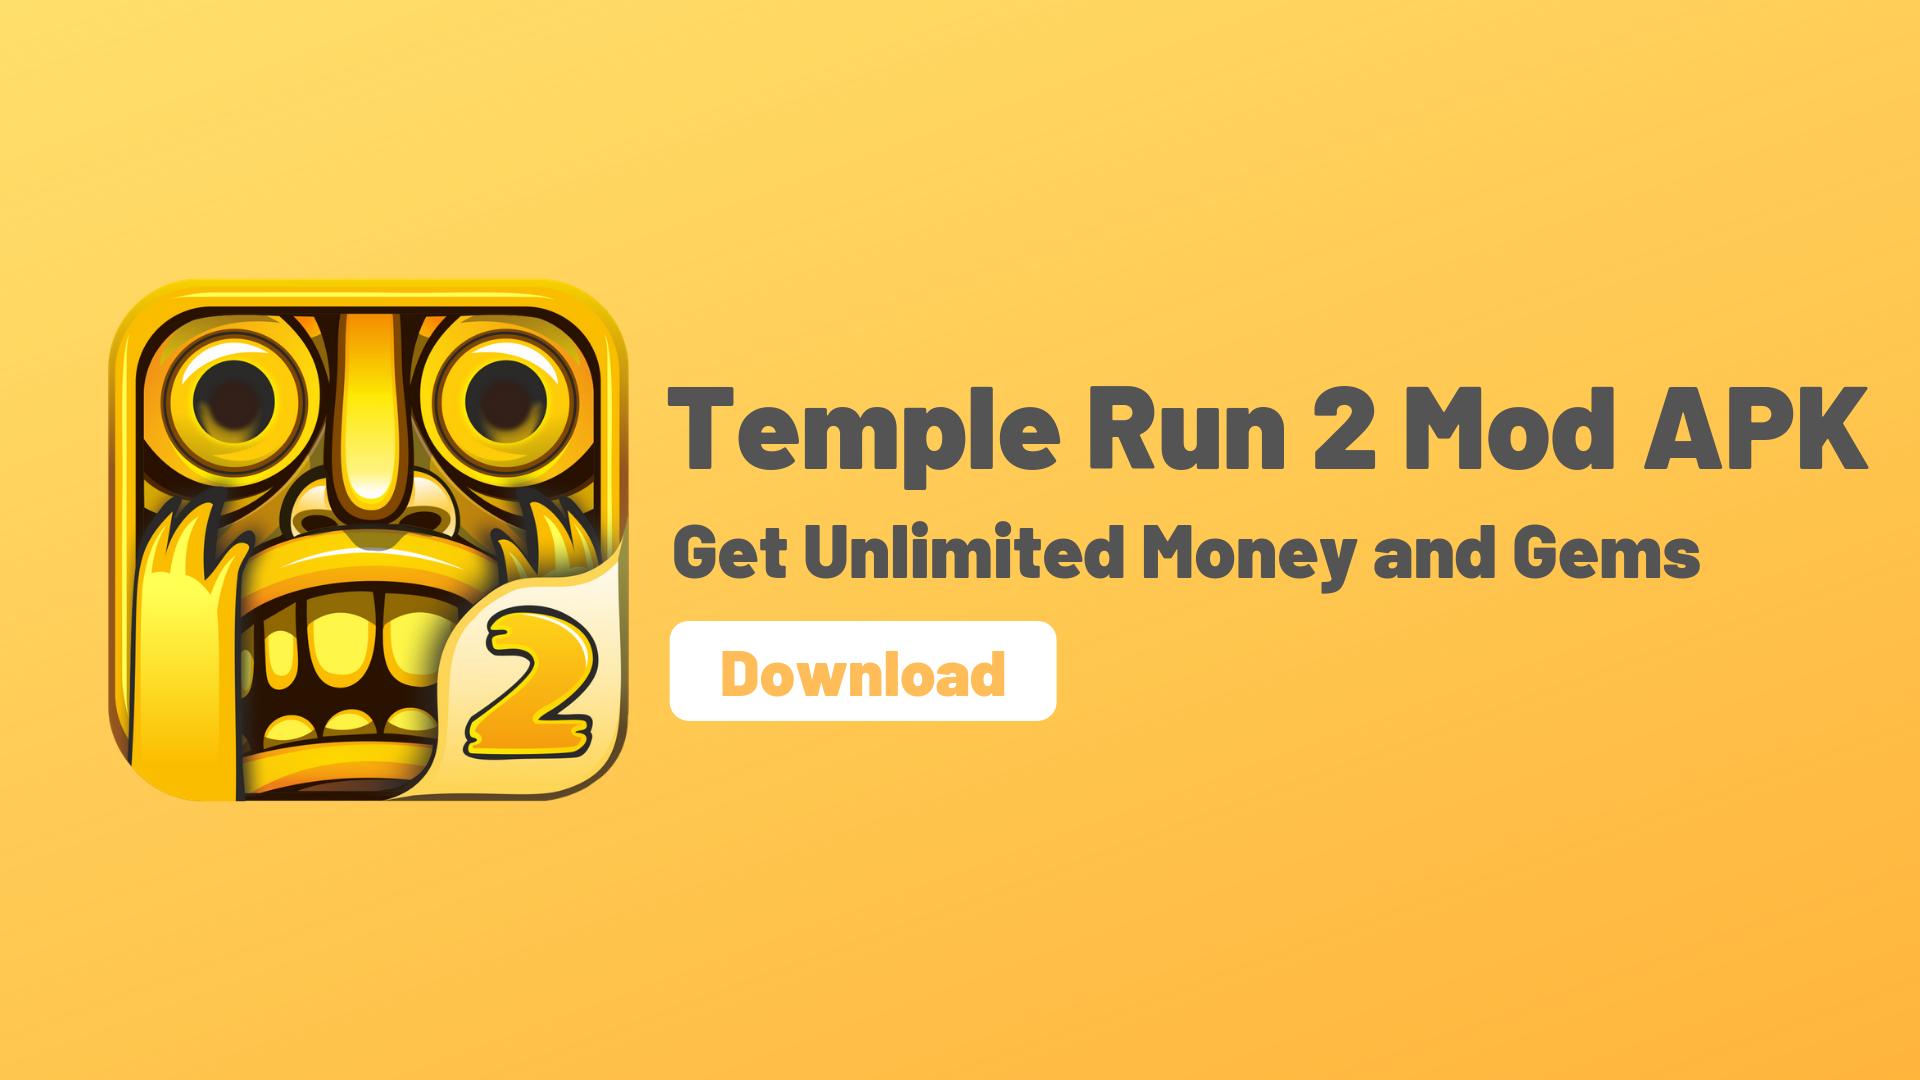 Download Temple Run 2 MOD APK | Trending Tech | Latest Technology